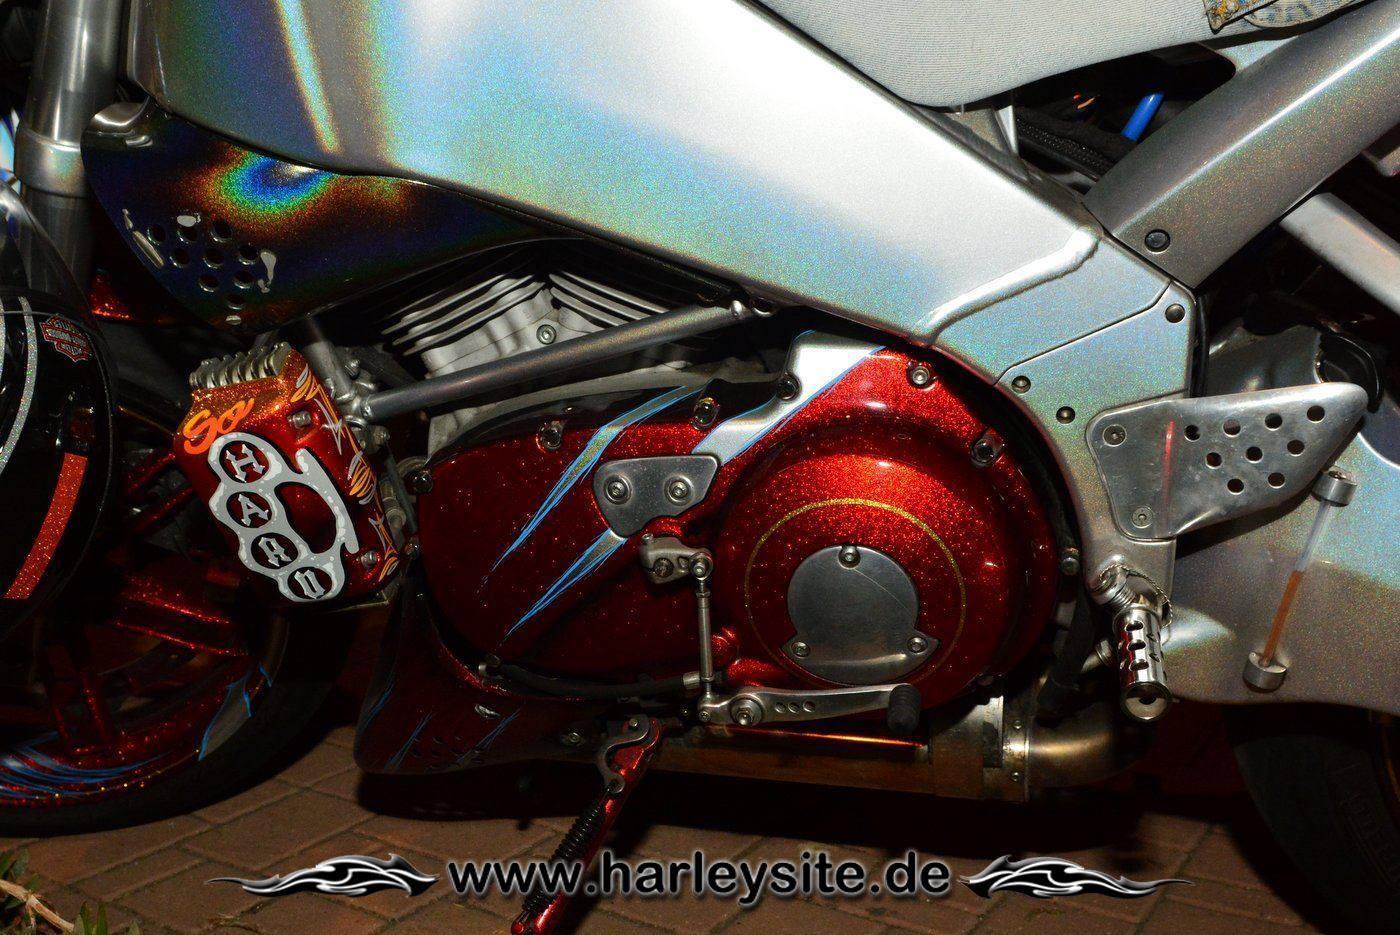 110th Harley Rom 59